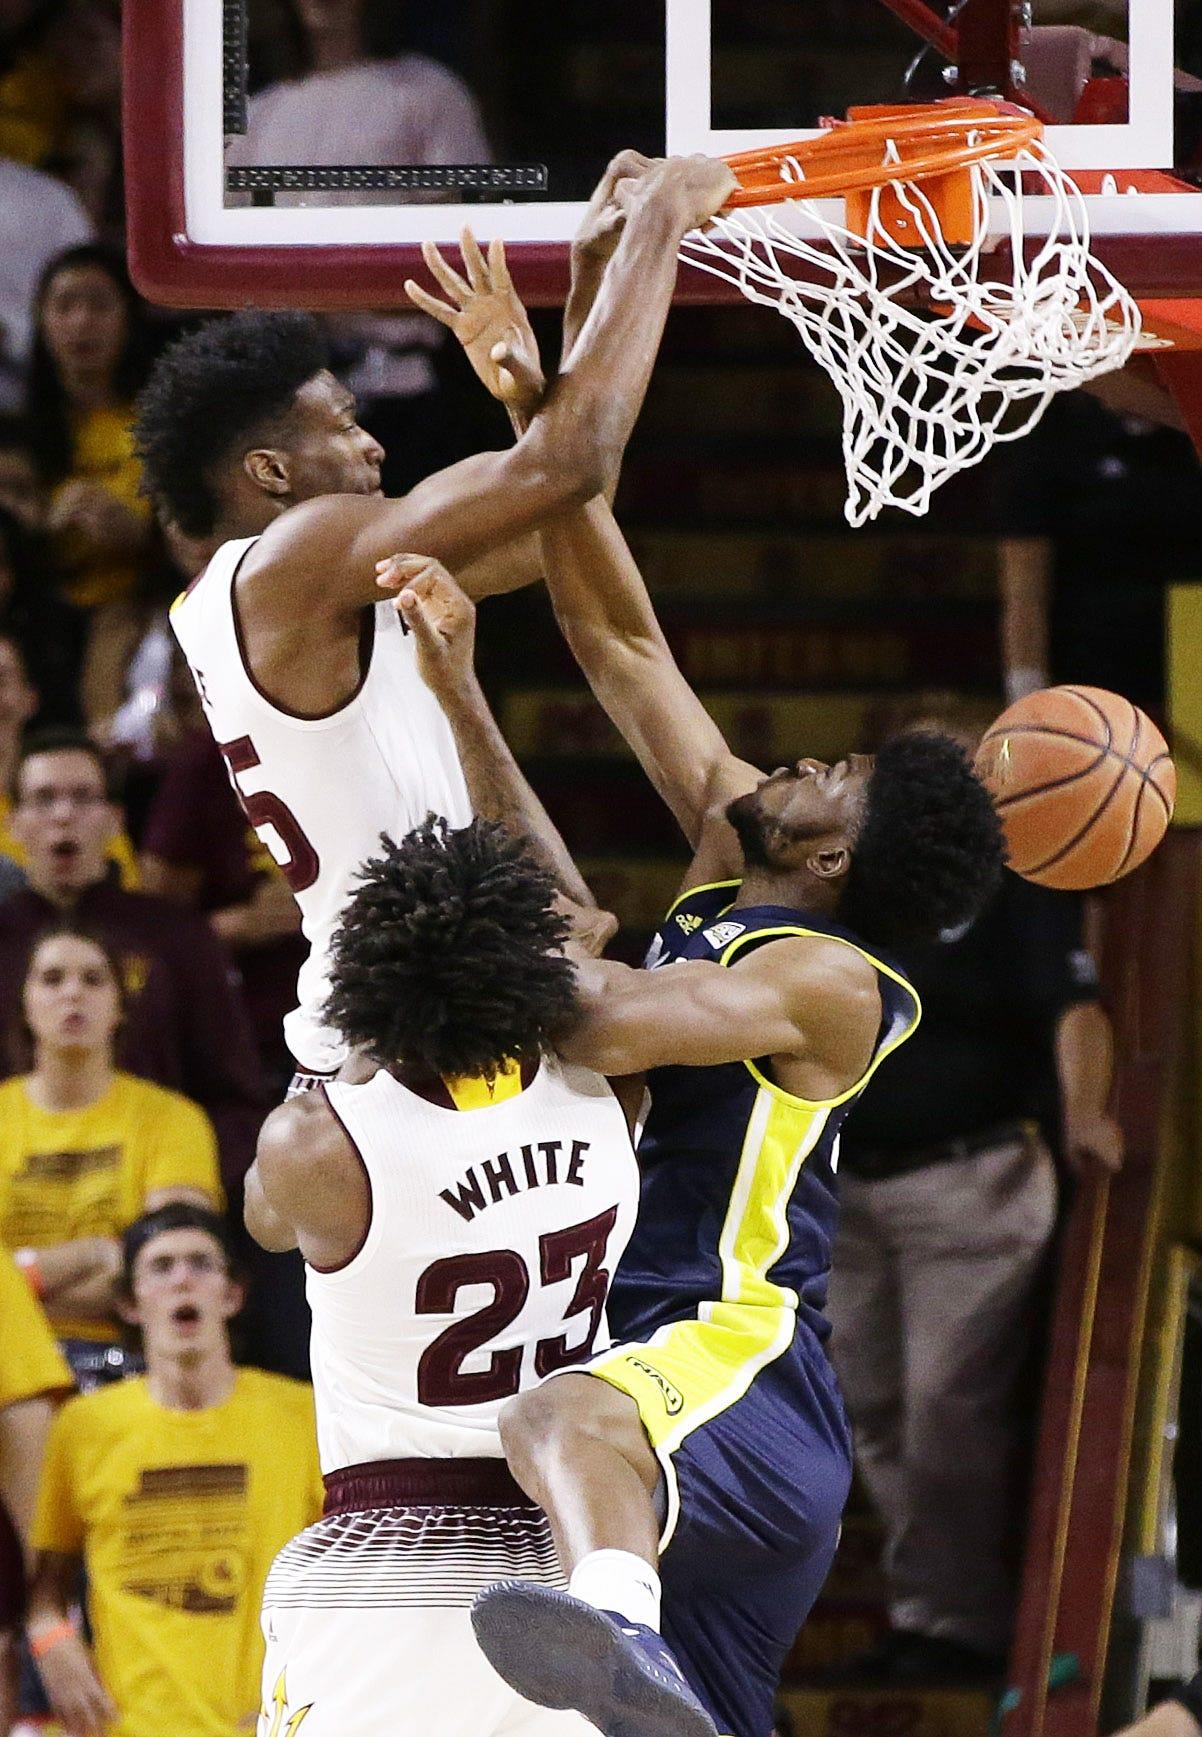 Arizona State forward De'Quon Lake dunks the ball over